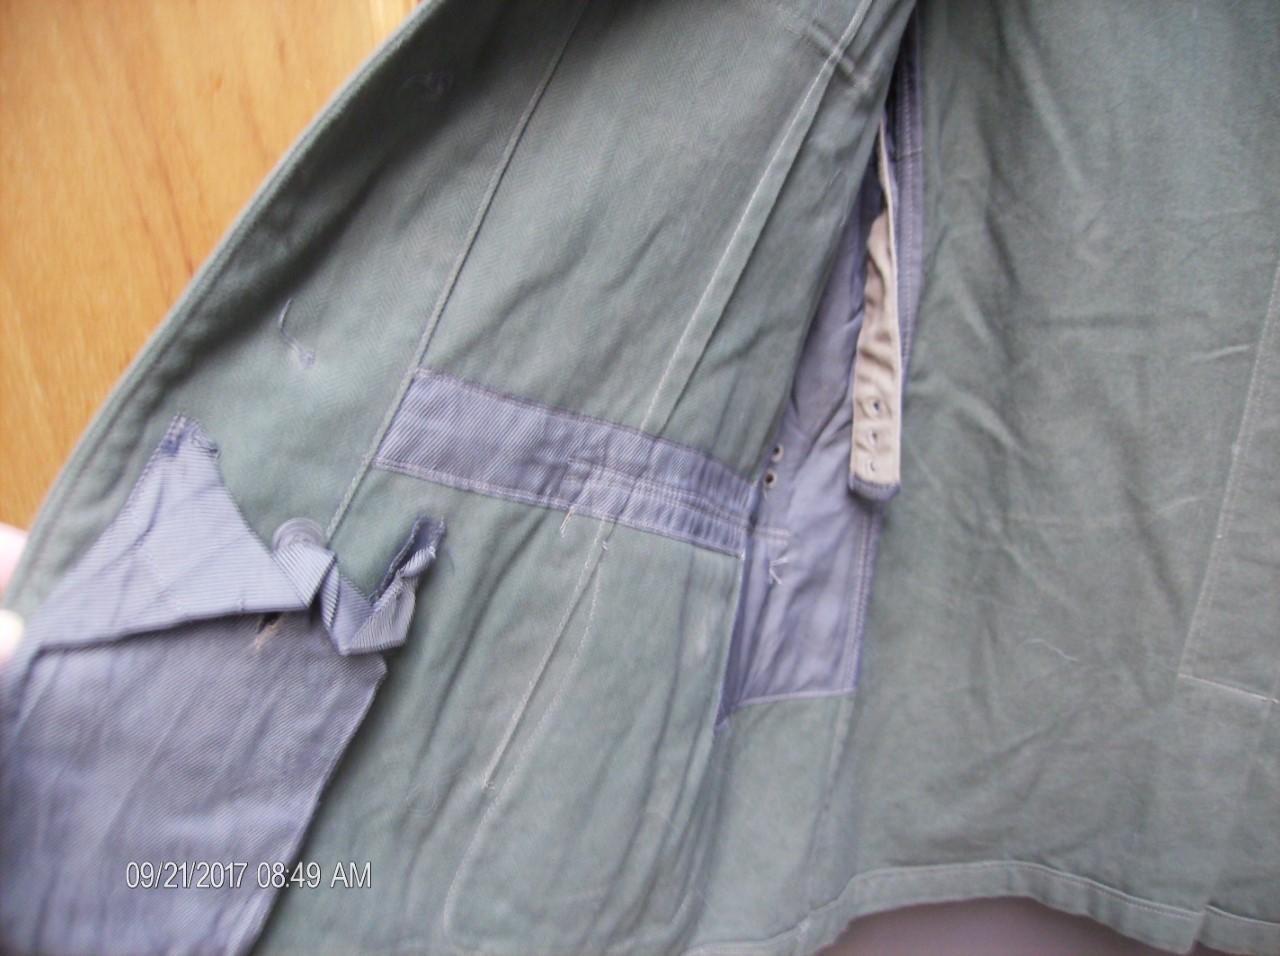 Authentification Drillich M43 Thumbn15